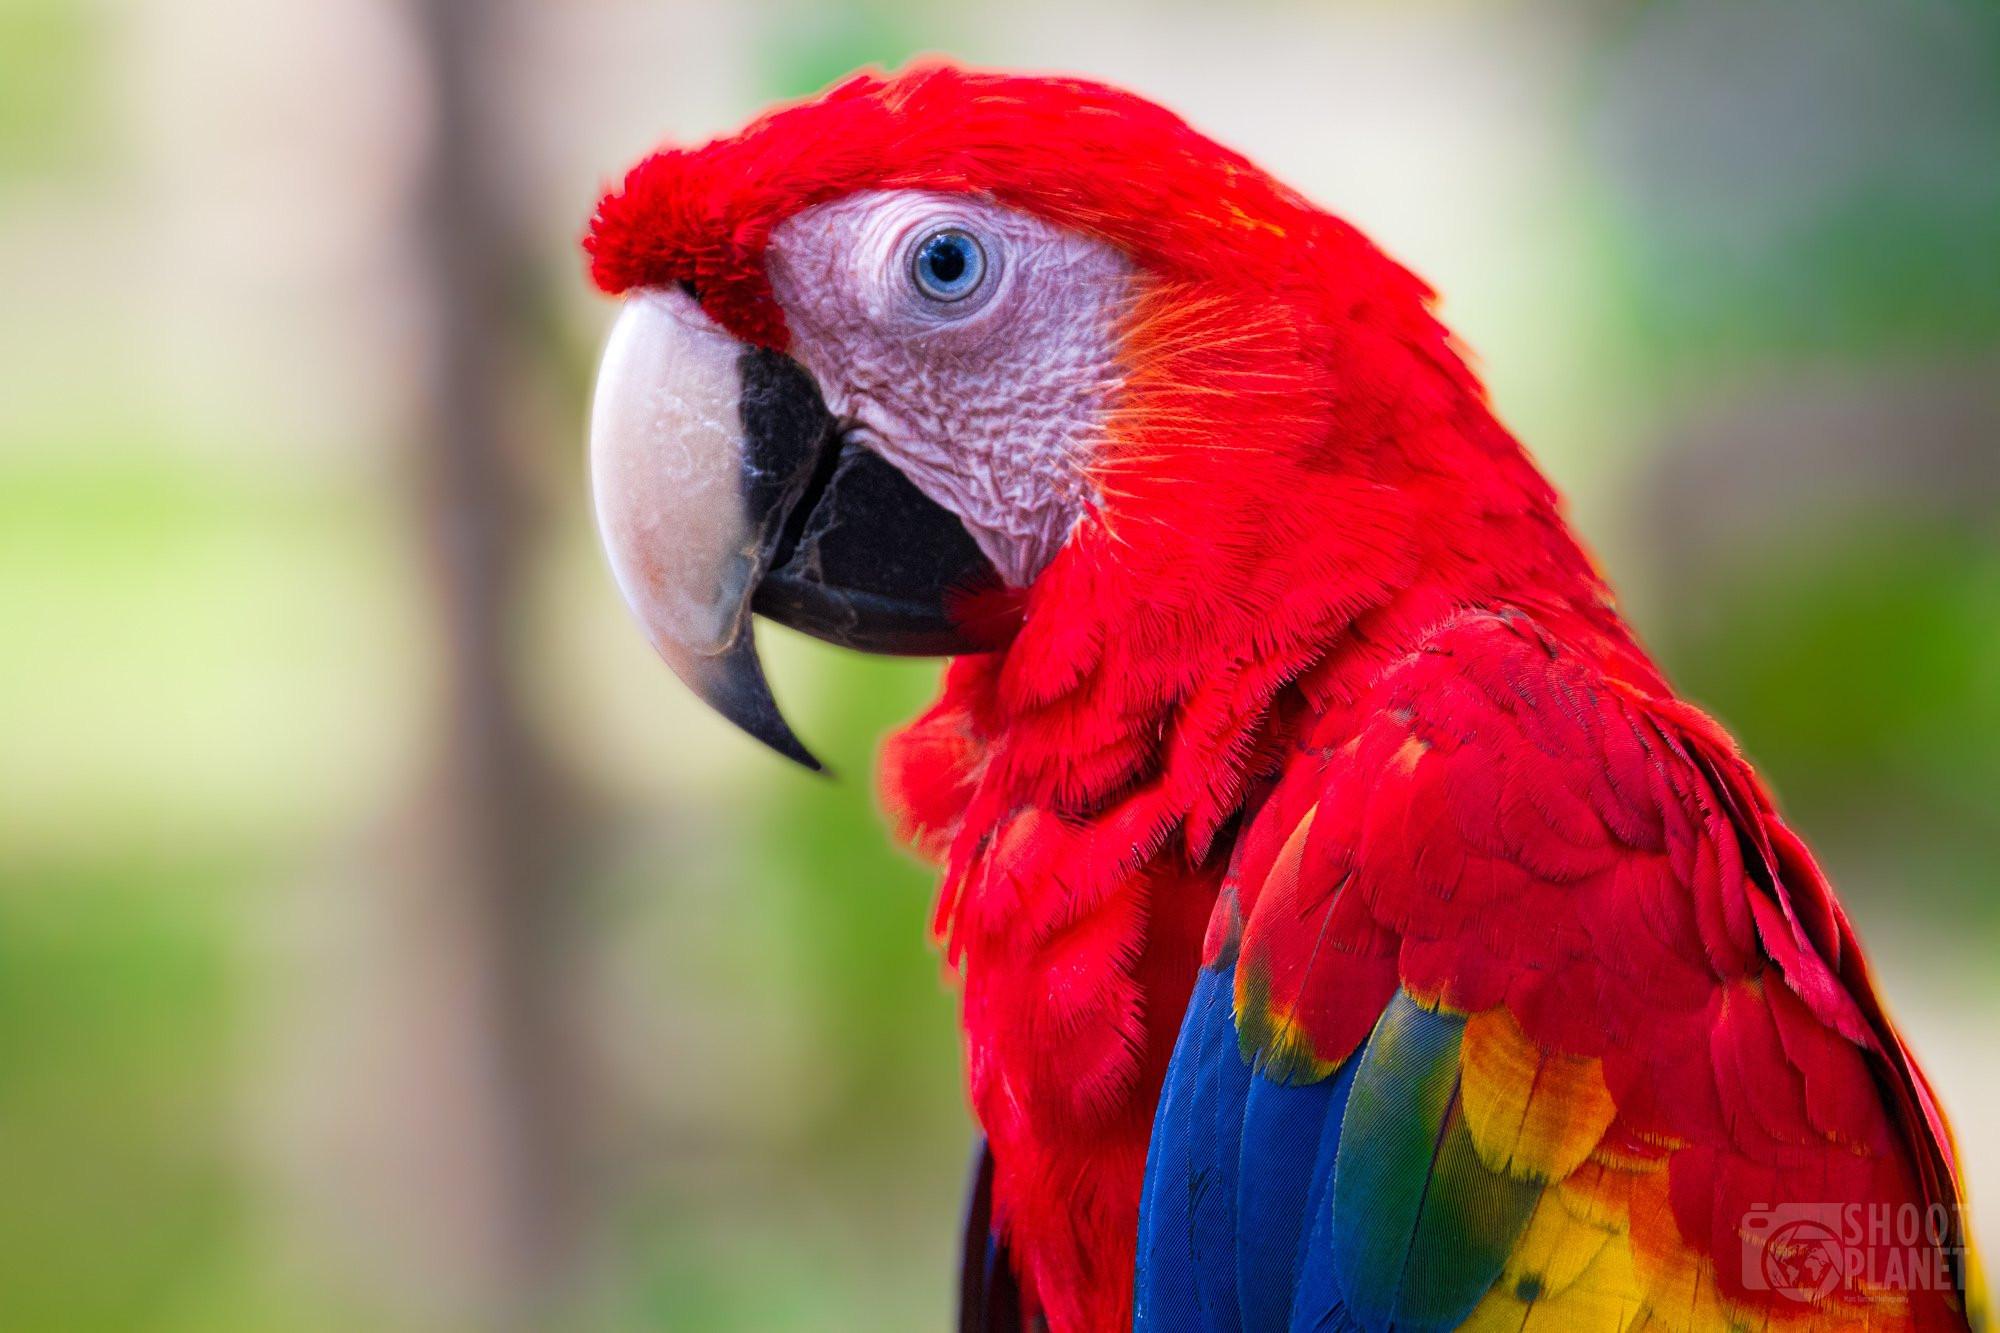 Scarlet macaw parrot portrait, Costa Rica